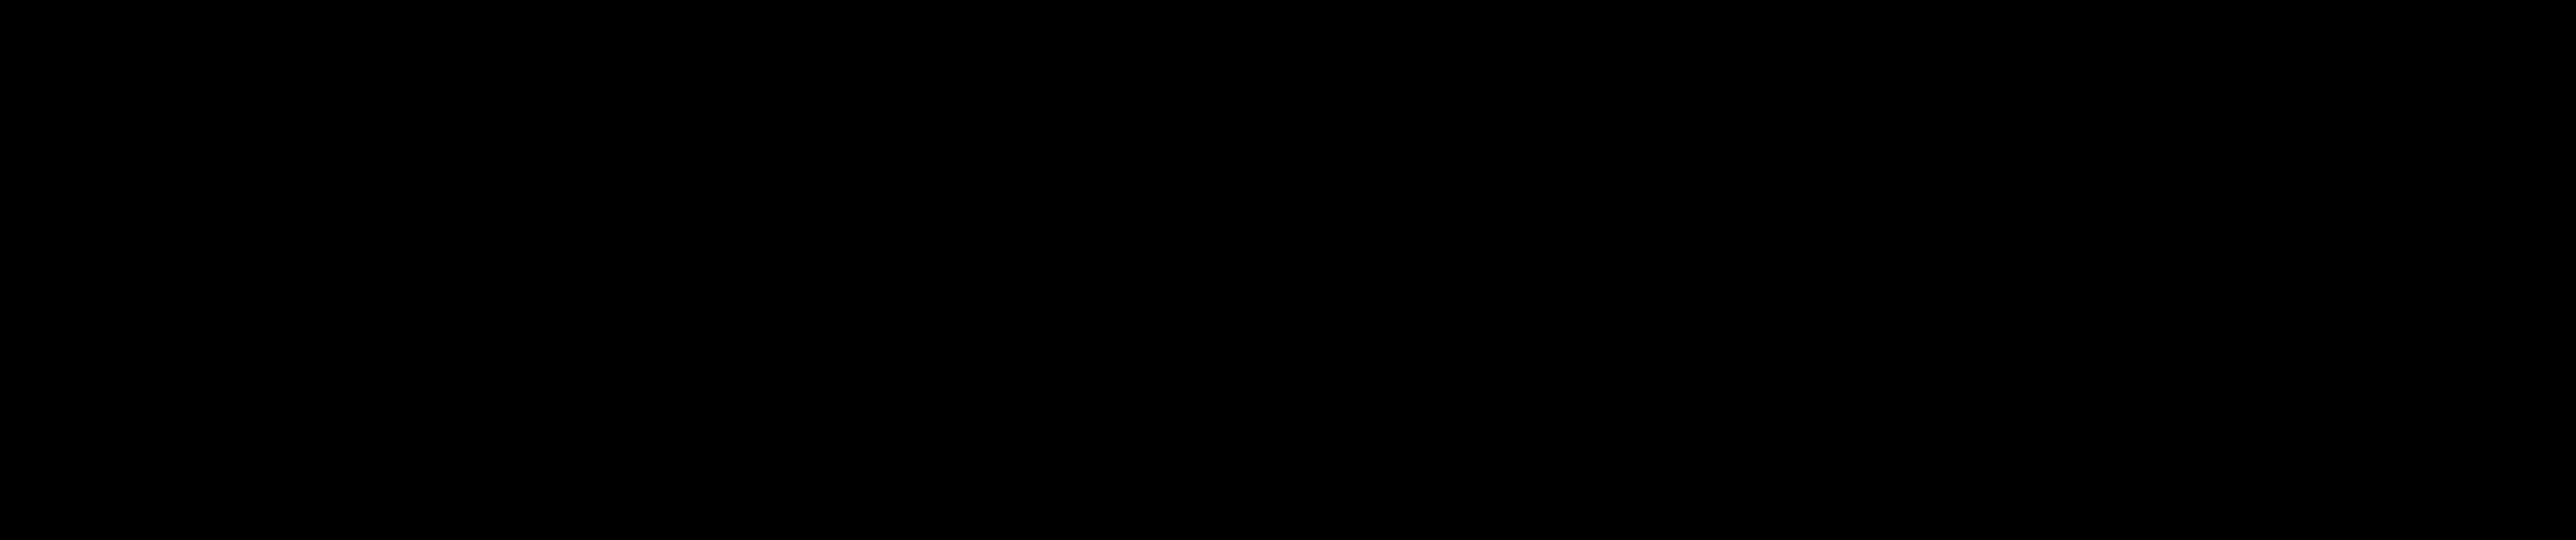 Alihankinta 2020 -logo